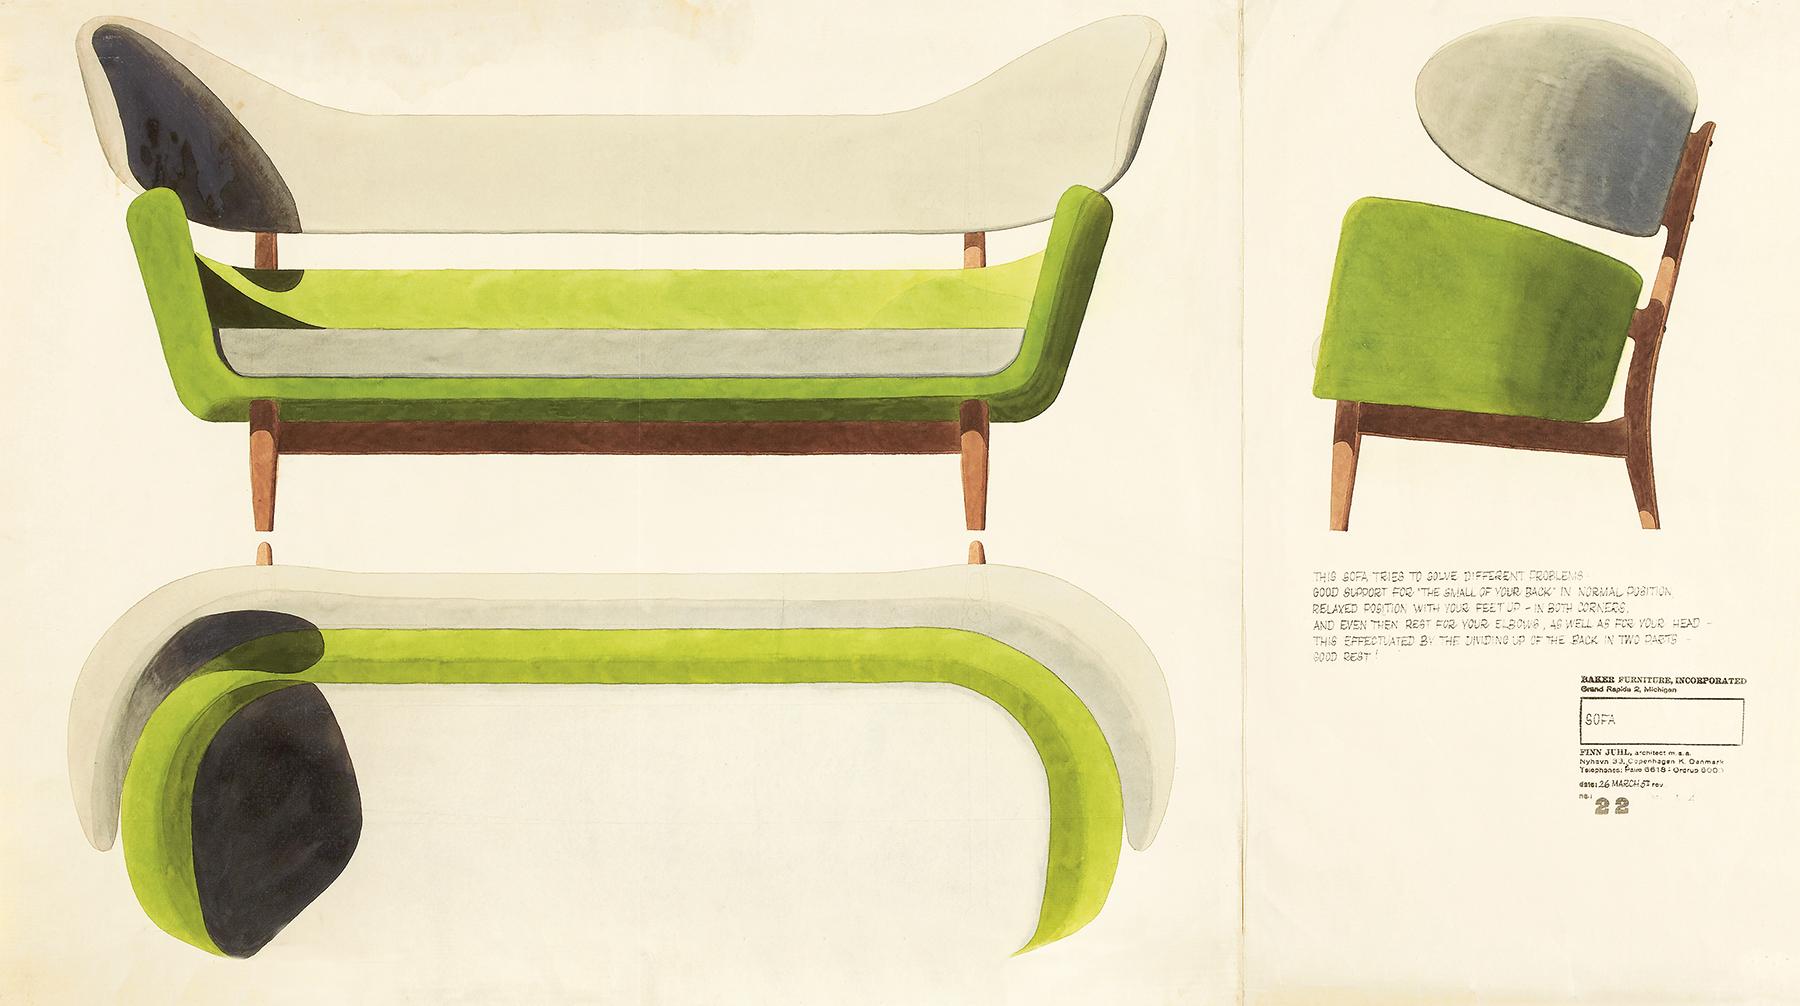 Juhl's designs for a 1957 sofa